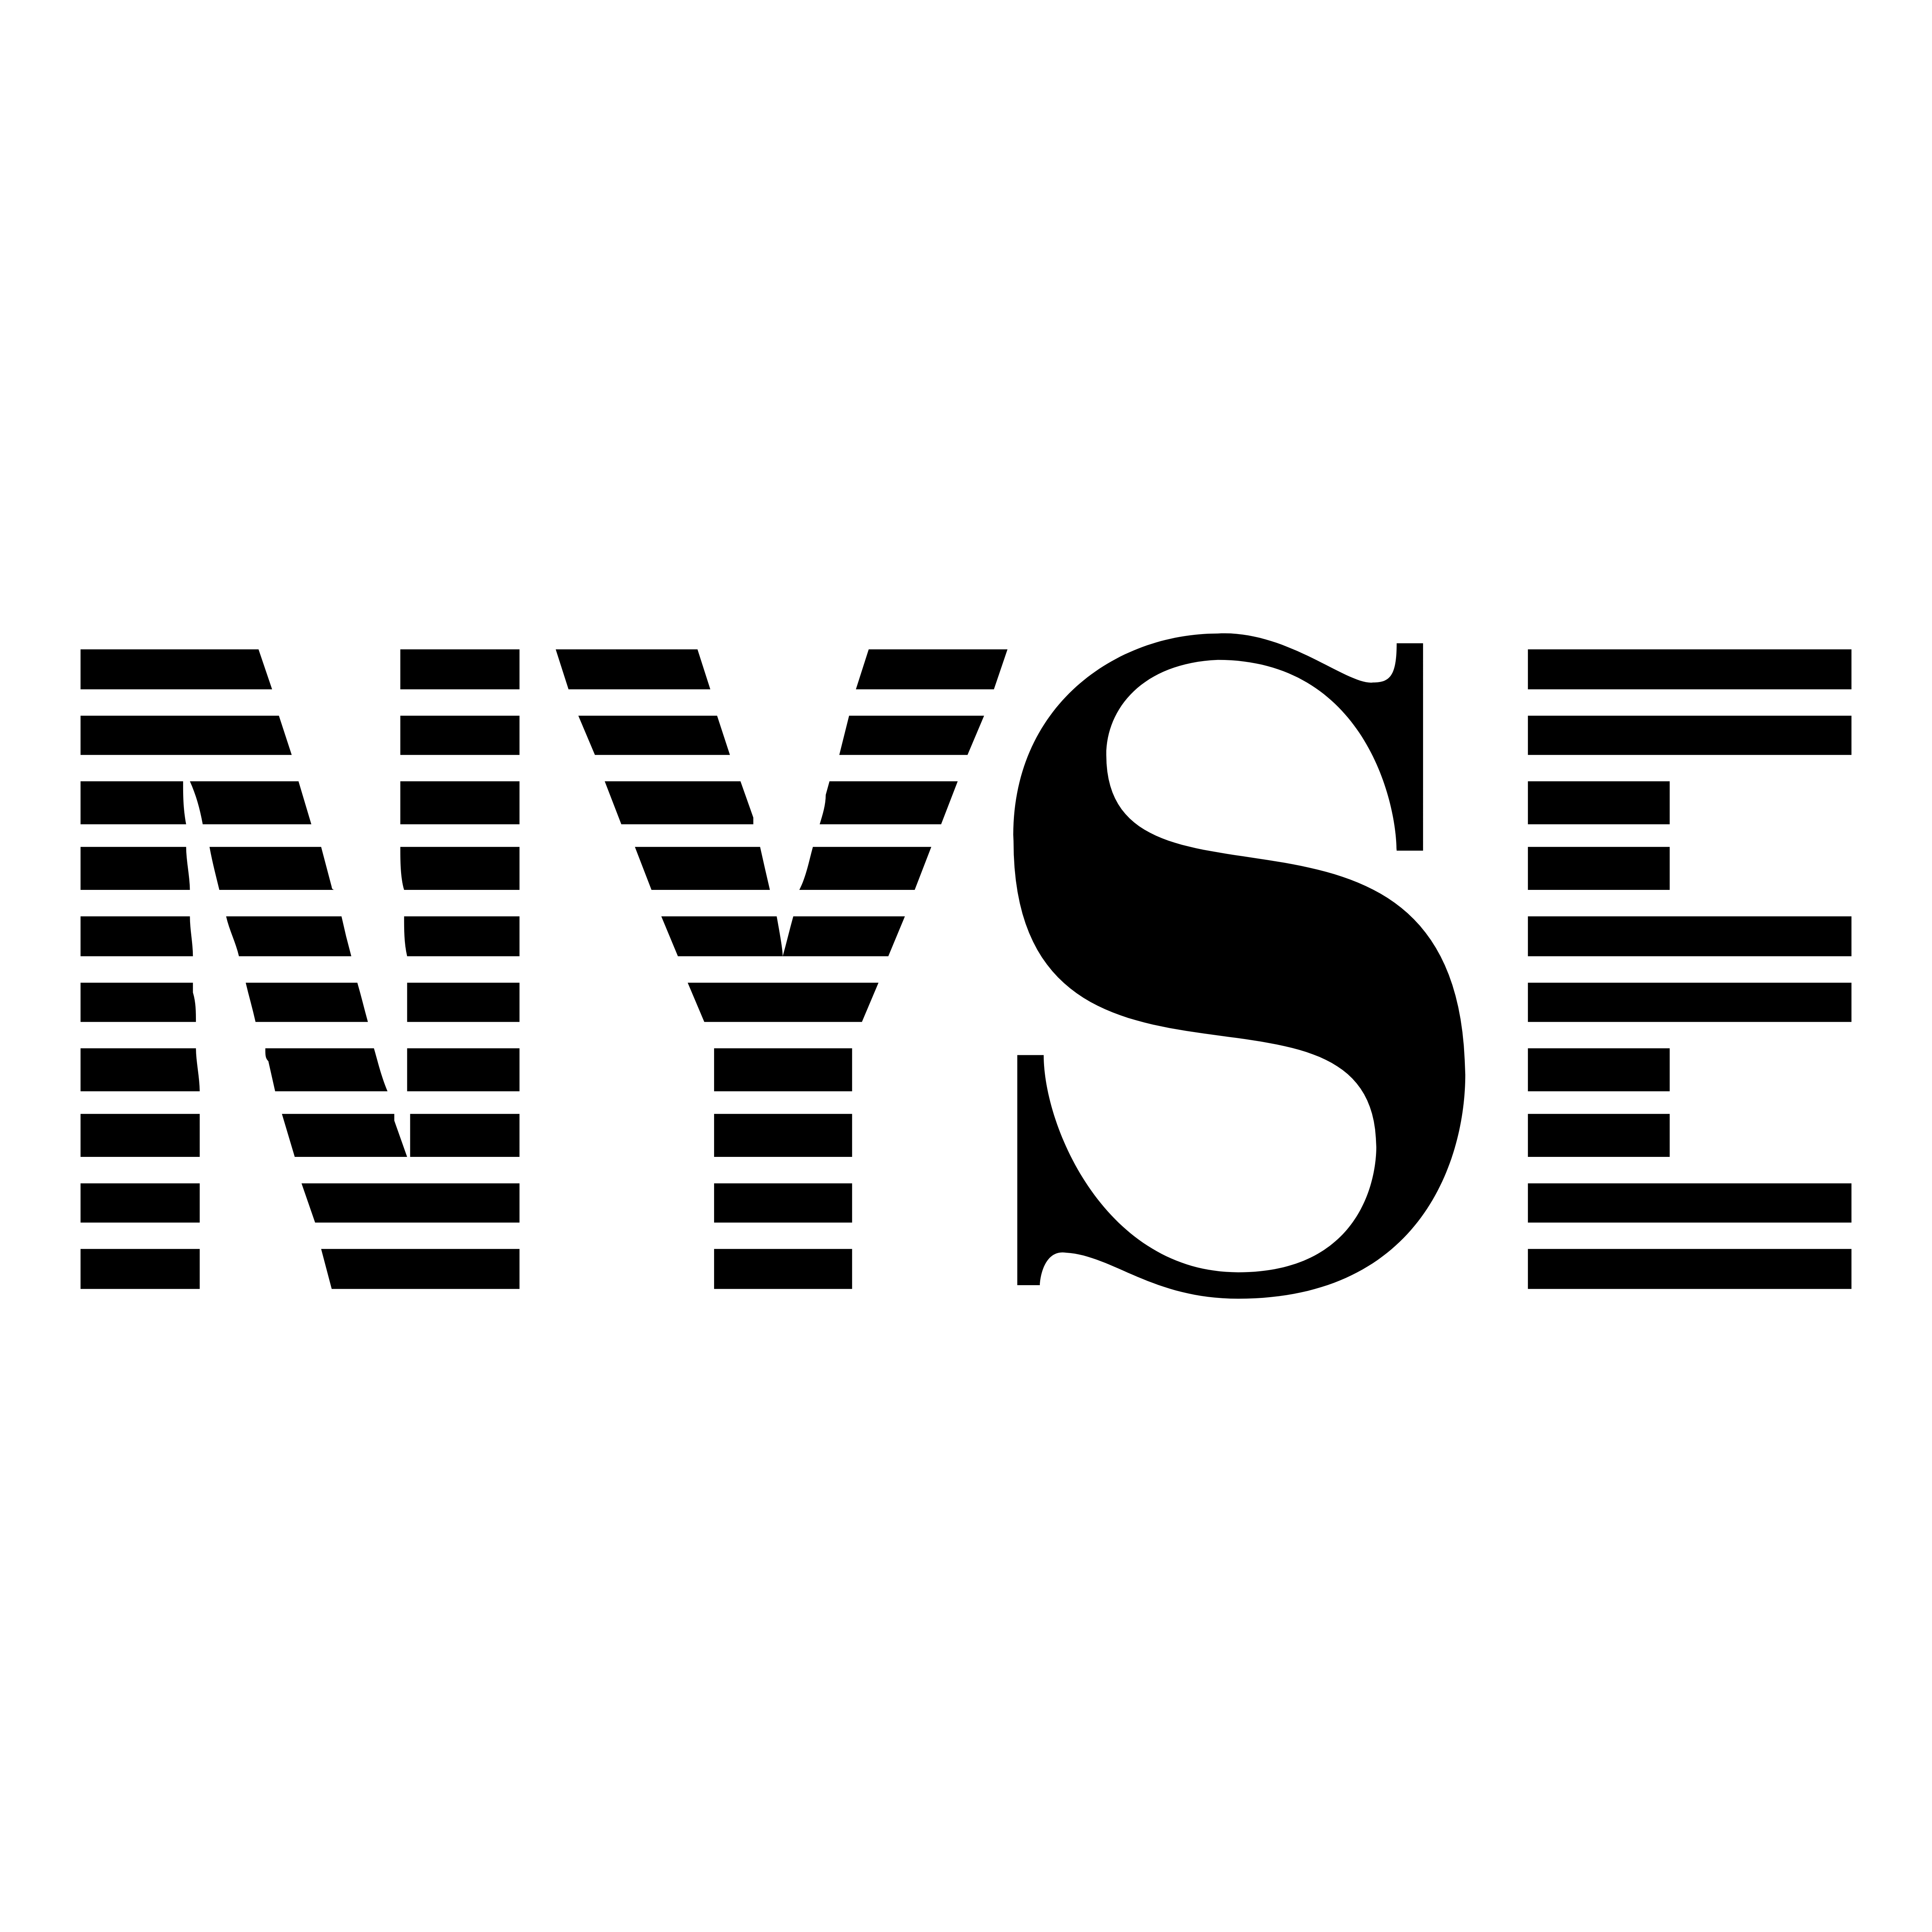 nyse new york stock exchange � logos download